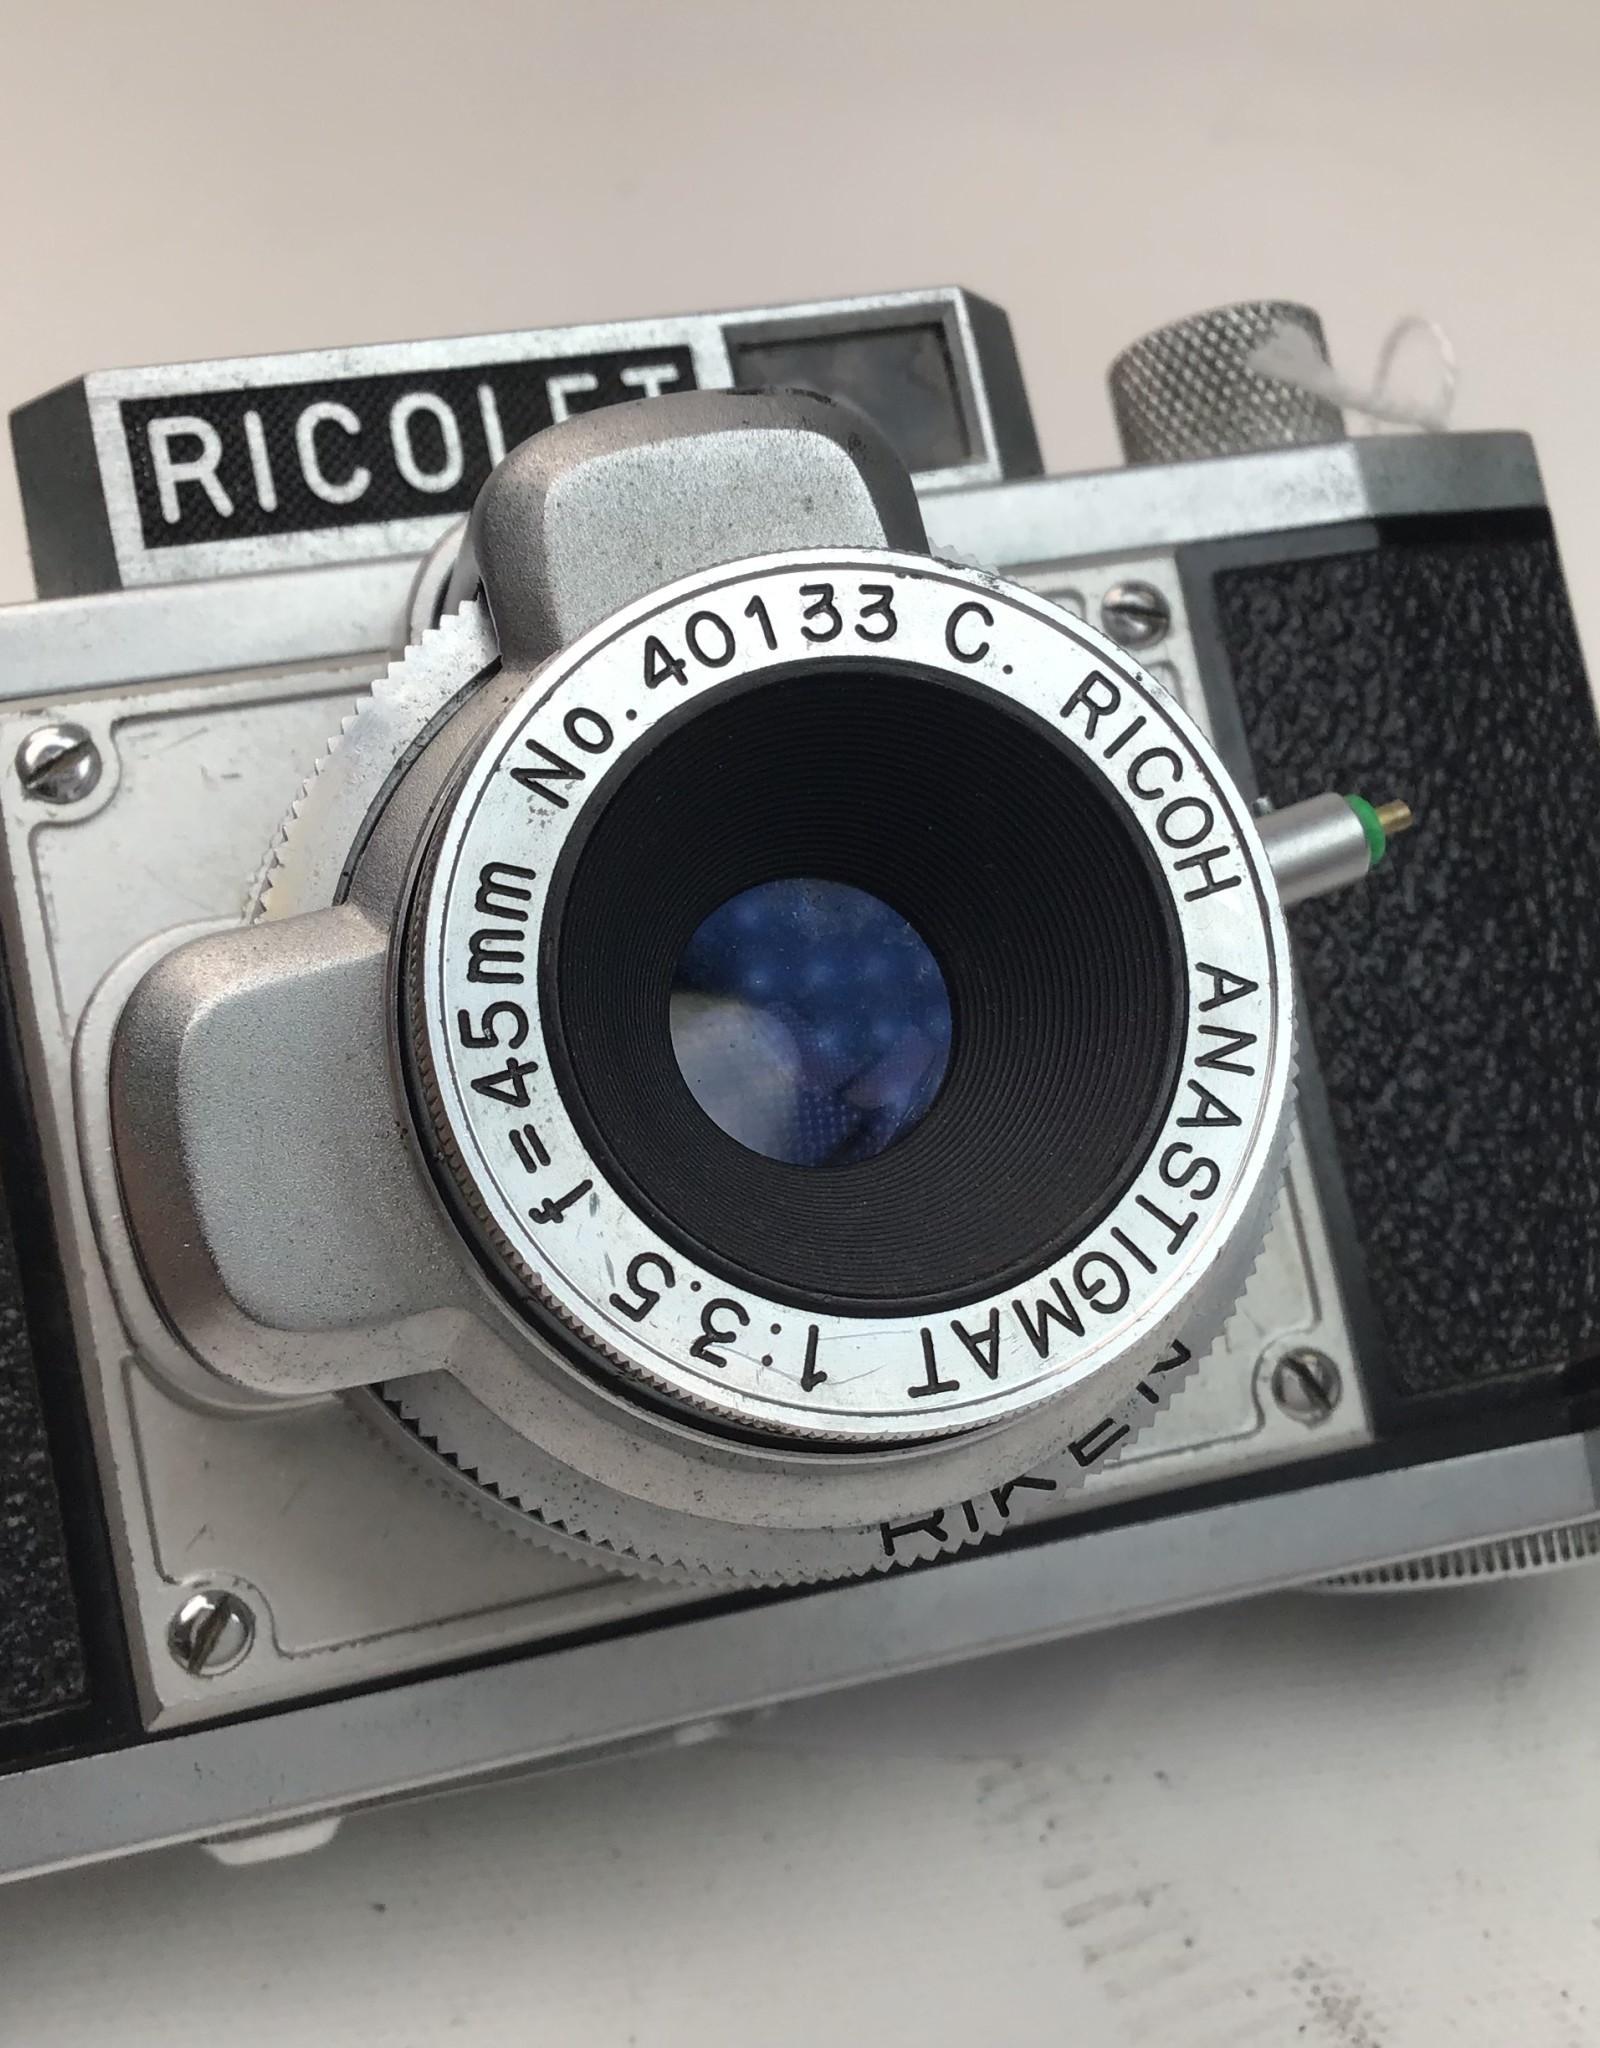 Ricolet Vintage 35mm Film Camera Used Disp